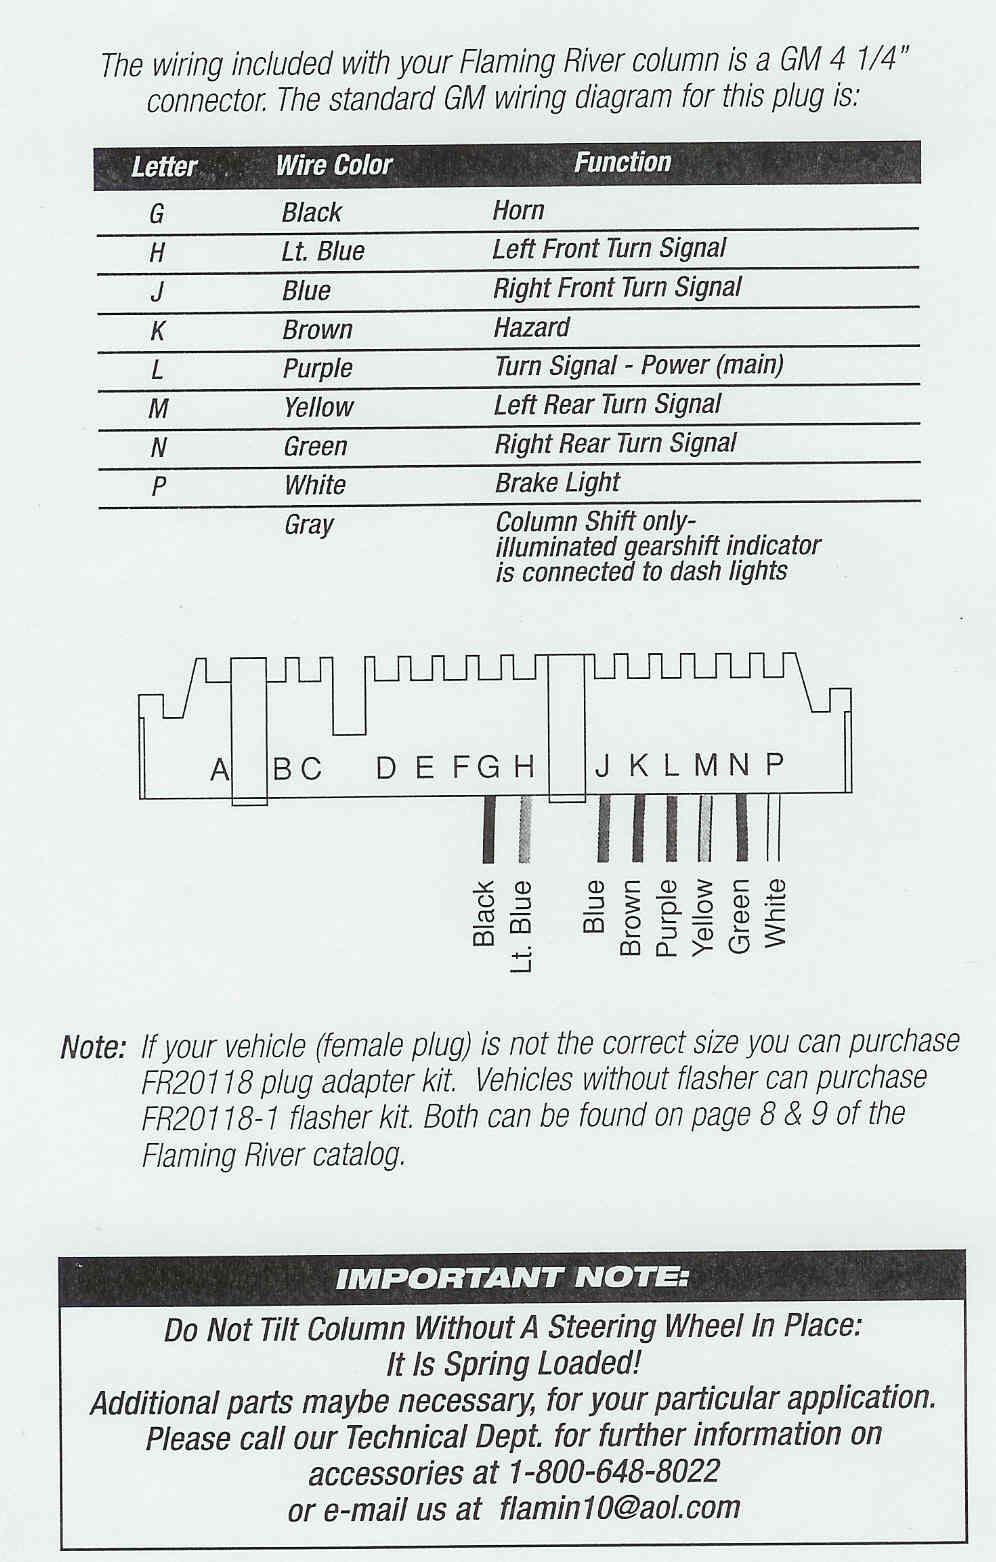 1985 Chevy Truck Steering Column Diagram : chevy, truck, steering, column, diagram, Ididit, Steering, Column, Wiring, Diagr, Column,, Chevy, Trucks,, Diagram